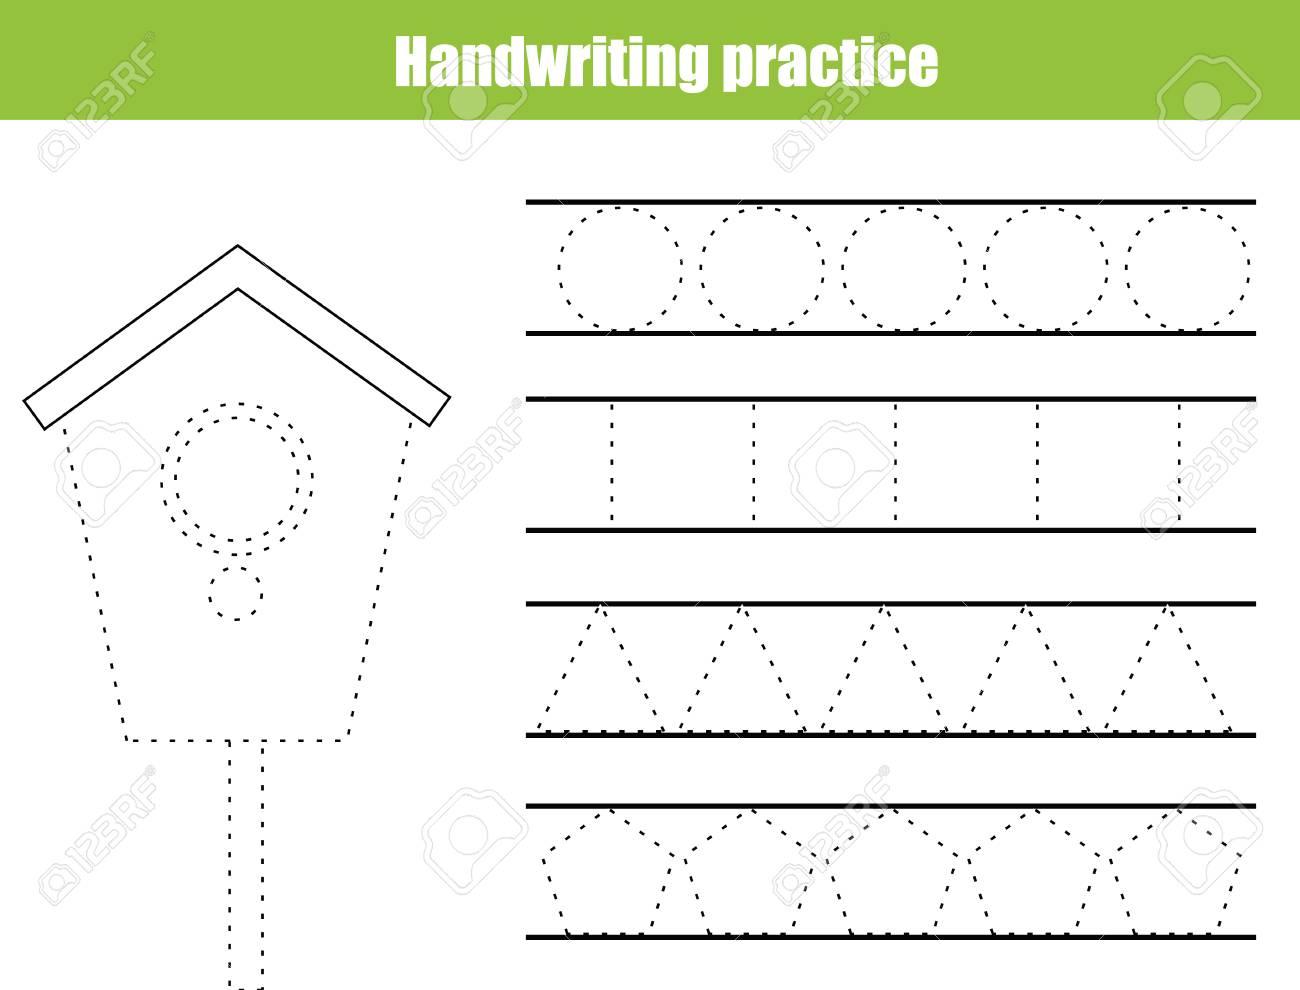 - Handwriting Practice Sheet. Educational Children Game, Printable